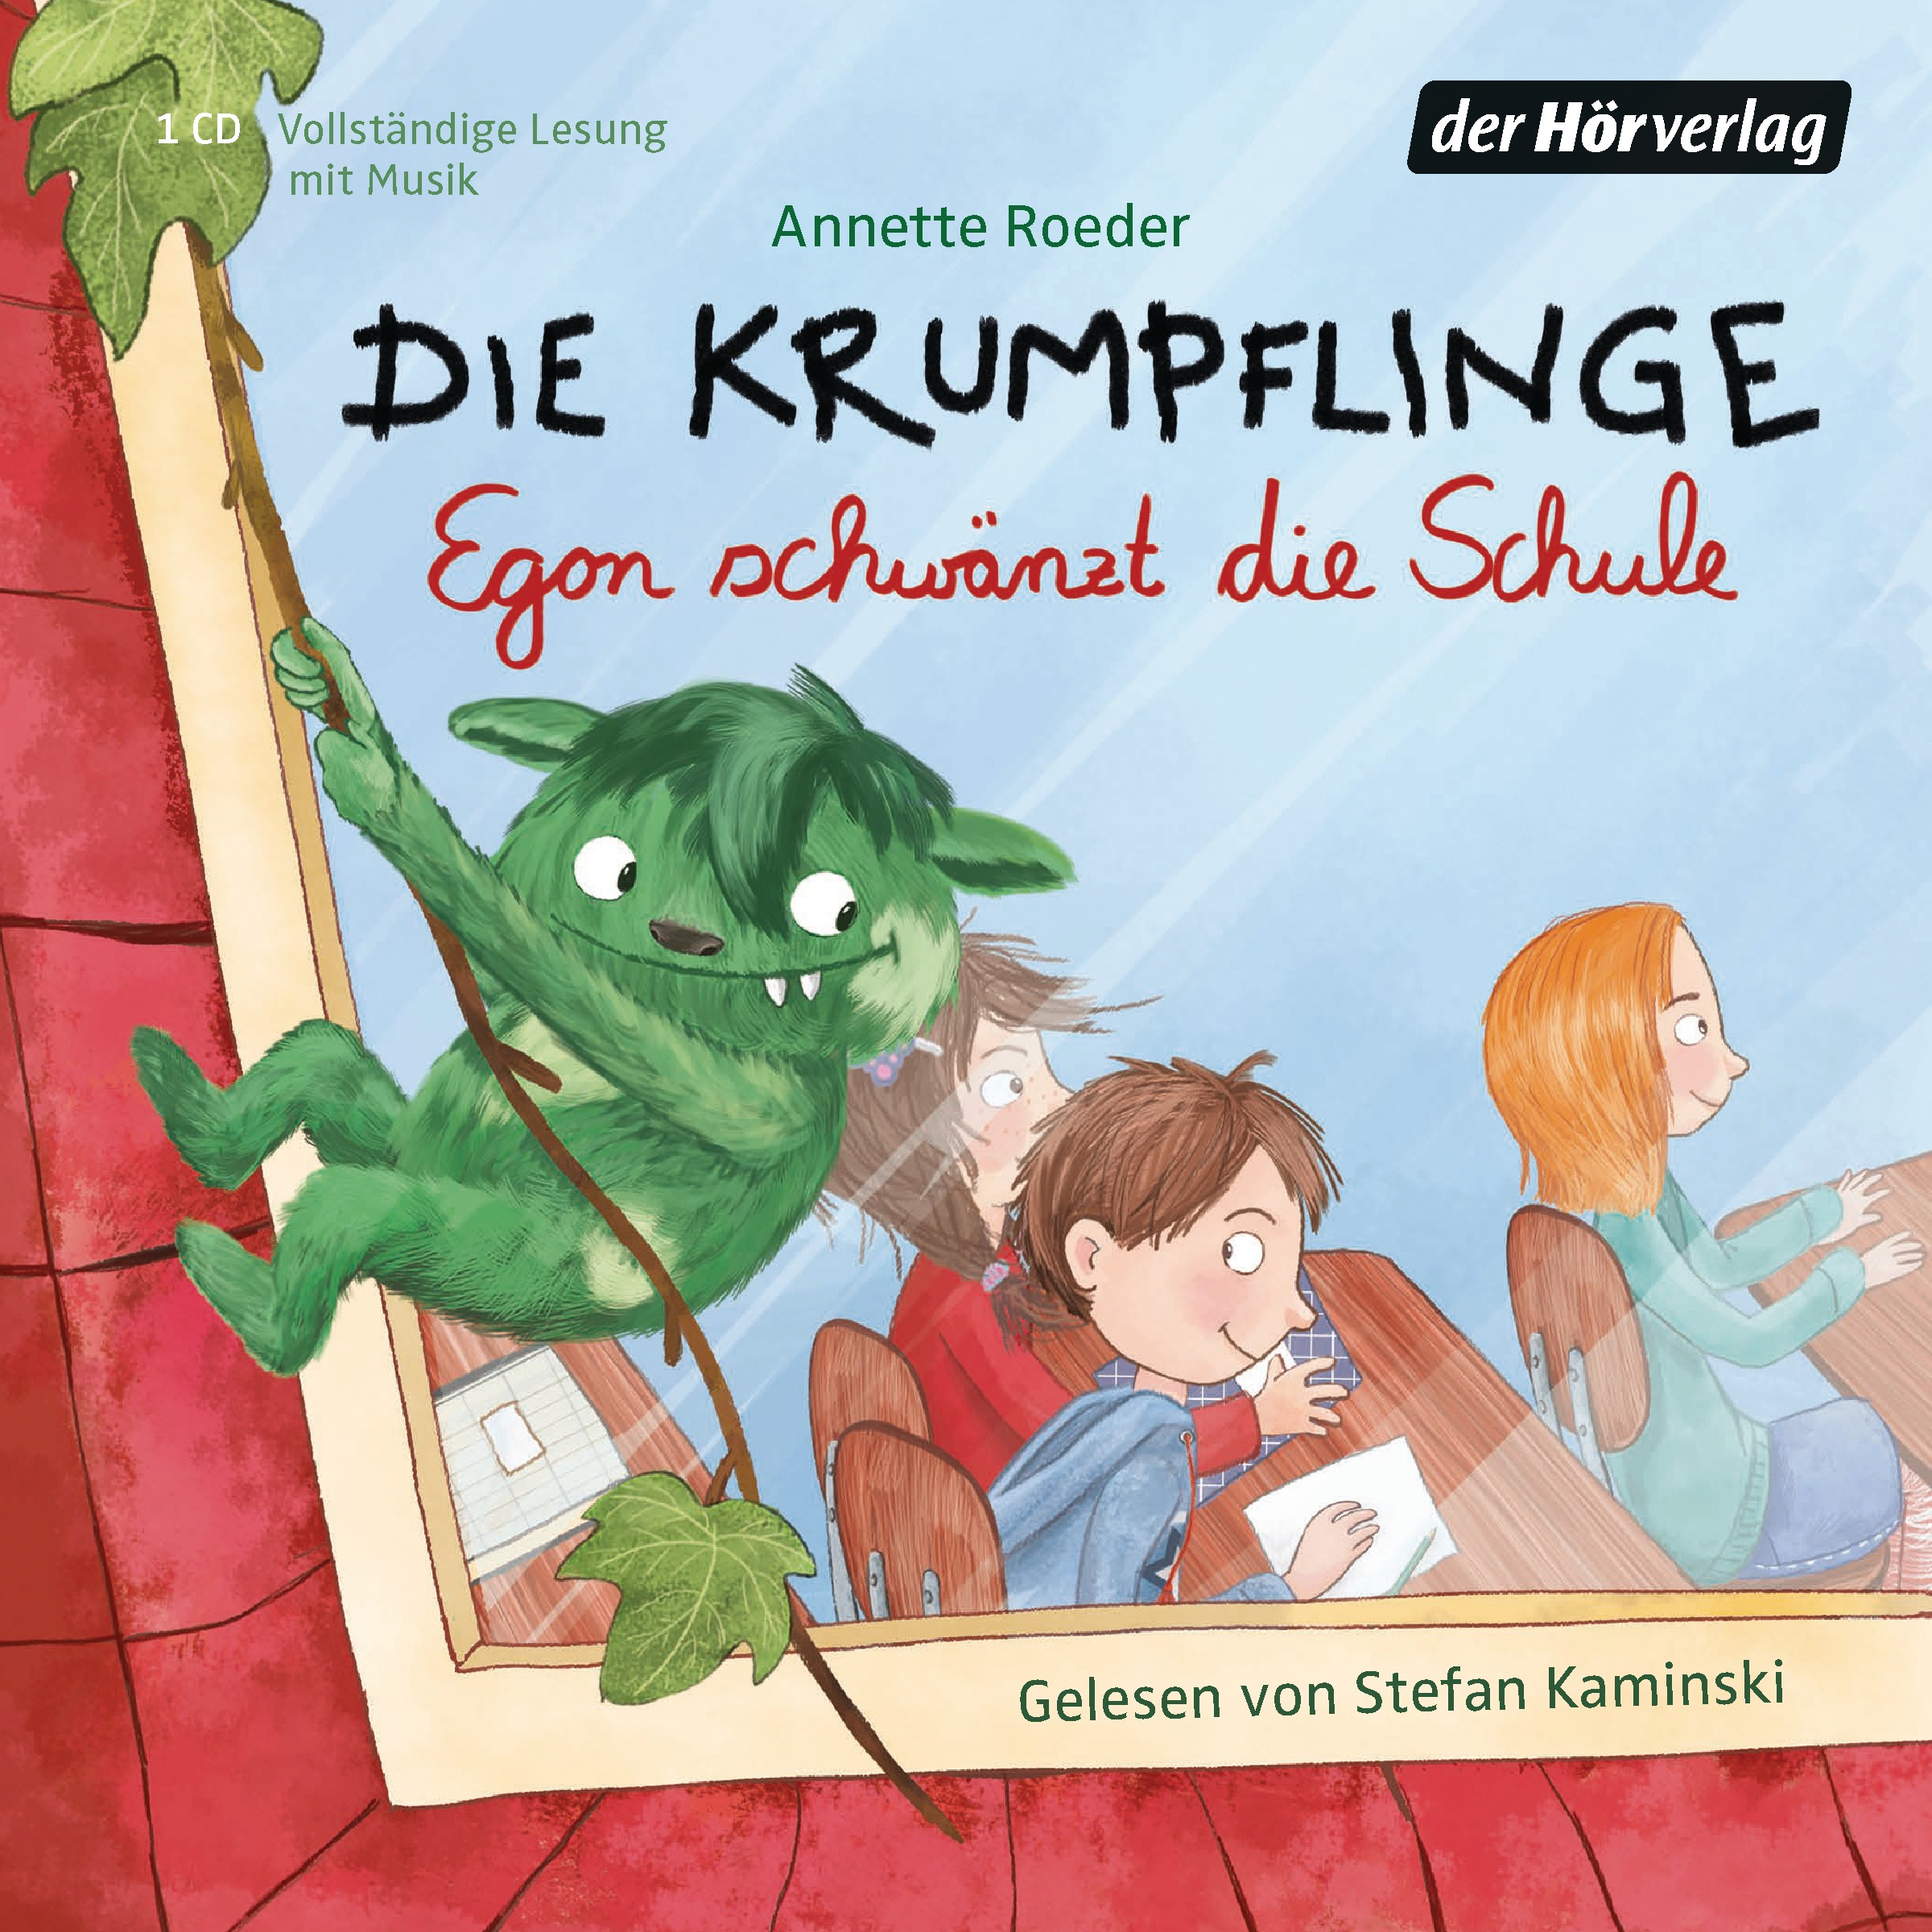 Die Krumpflinge: Folge 3 - Egon schwänzt die Schule - Annette Roeder